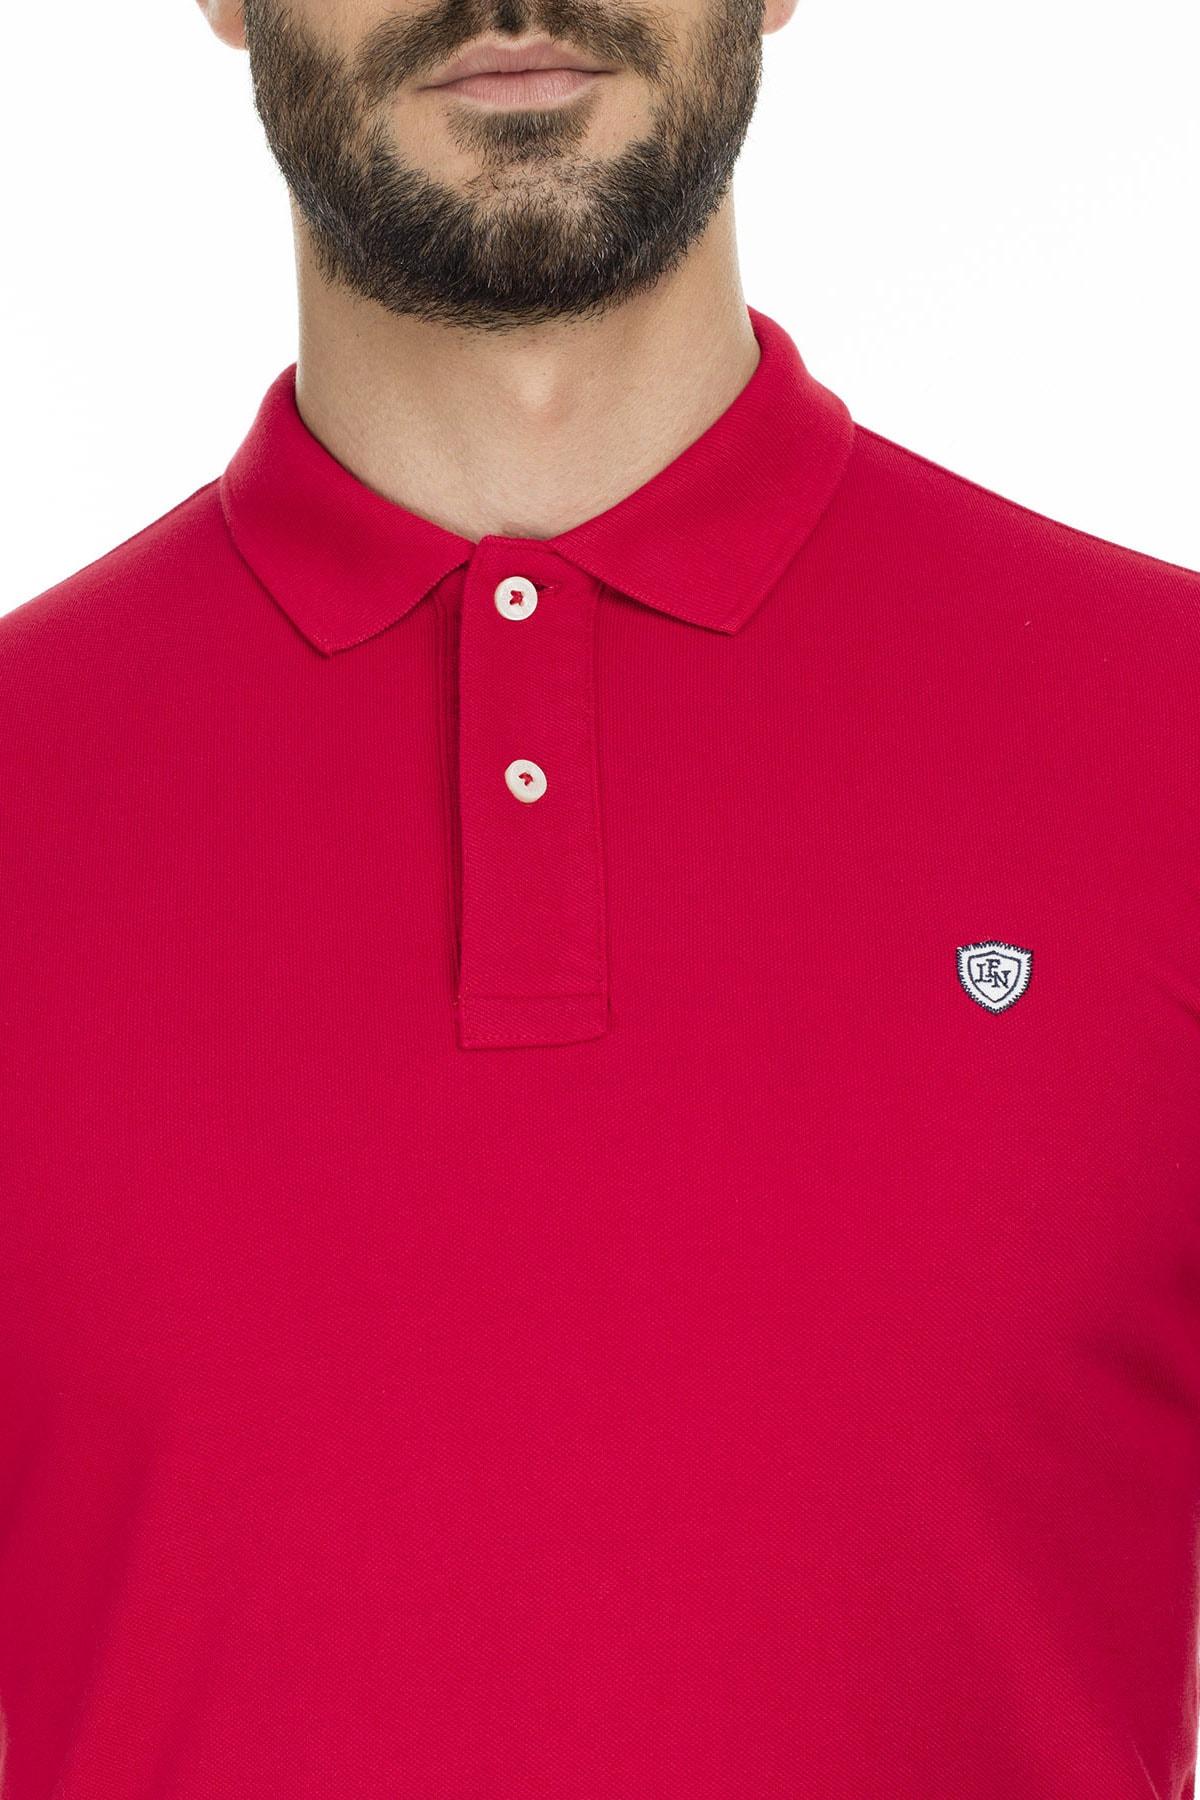 Lufian Laon Spor Polo T- Shirt Kırmızı 3